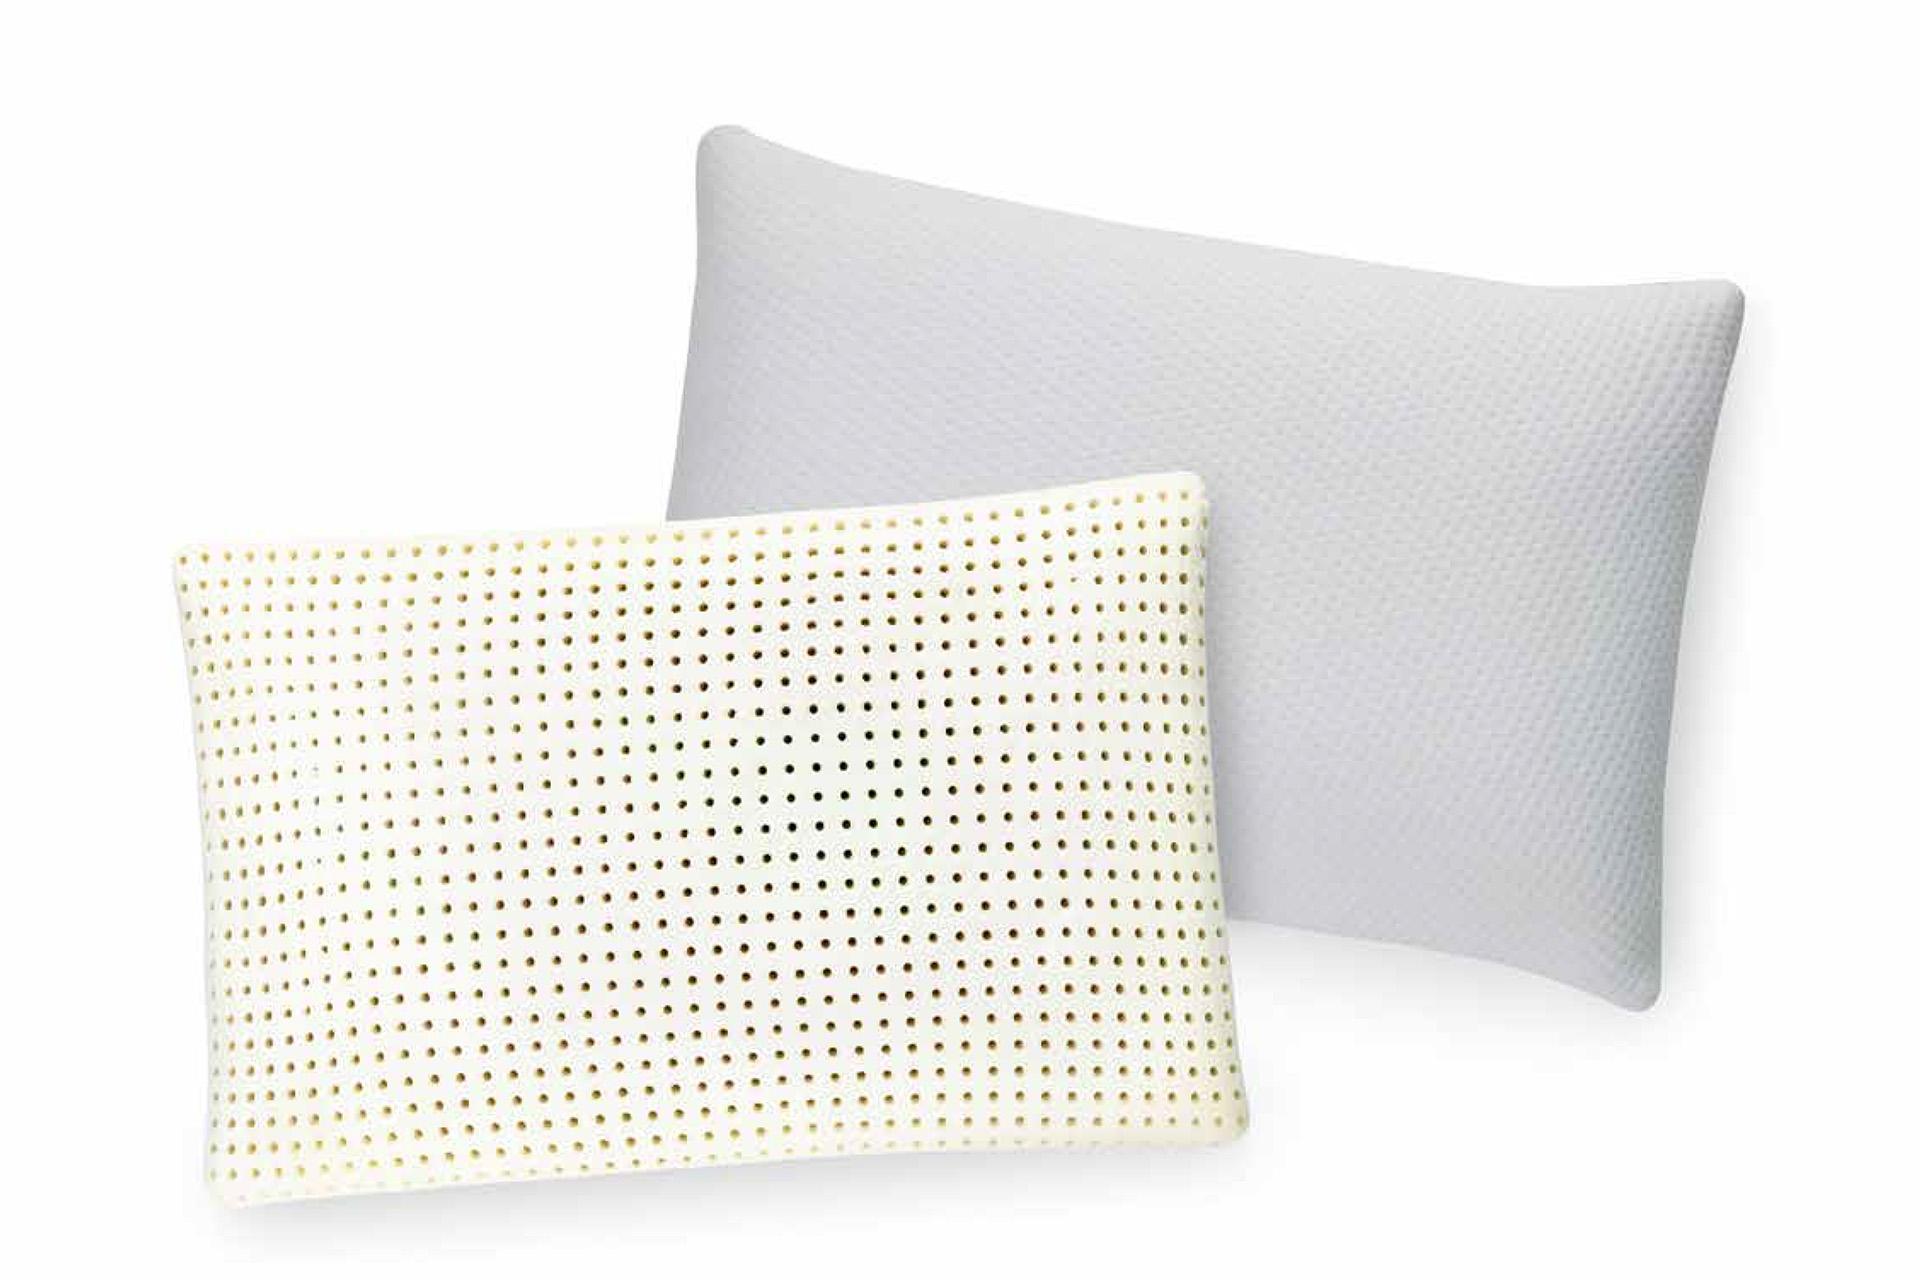 ventilated memory foam pillow